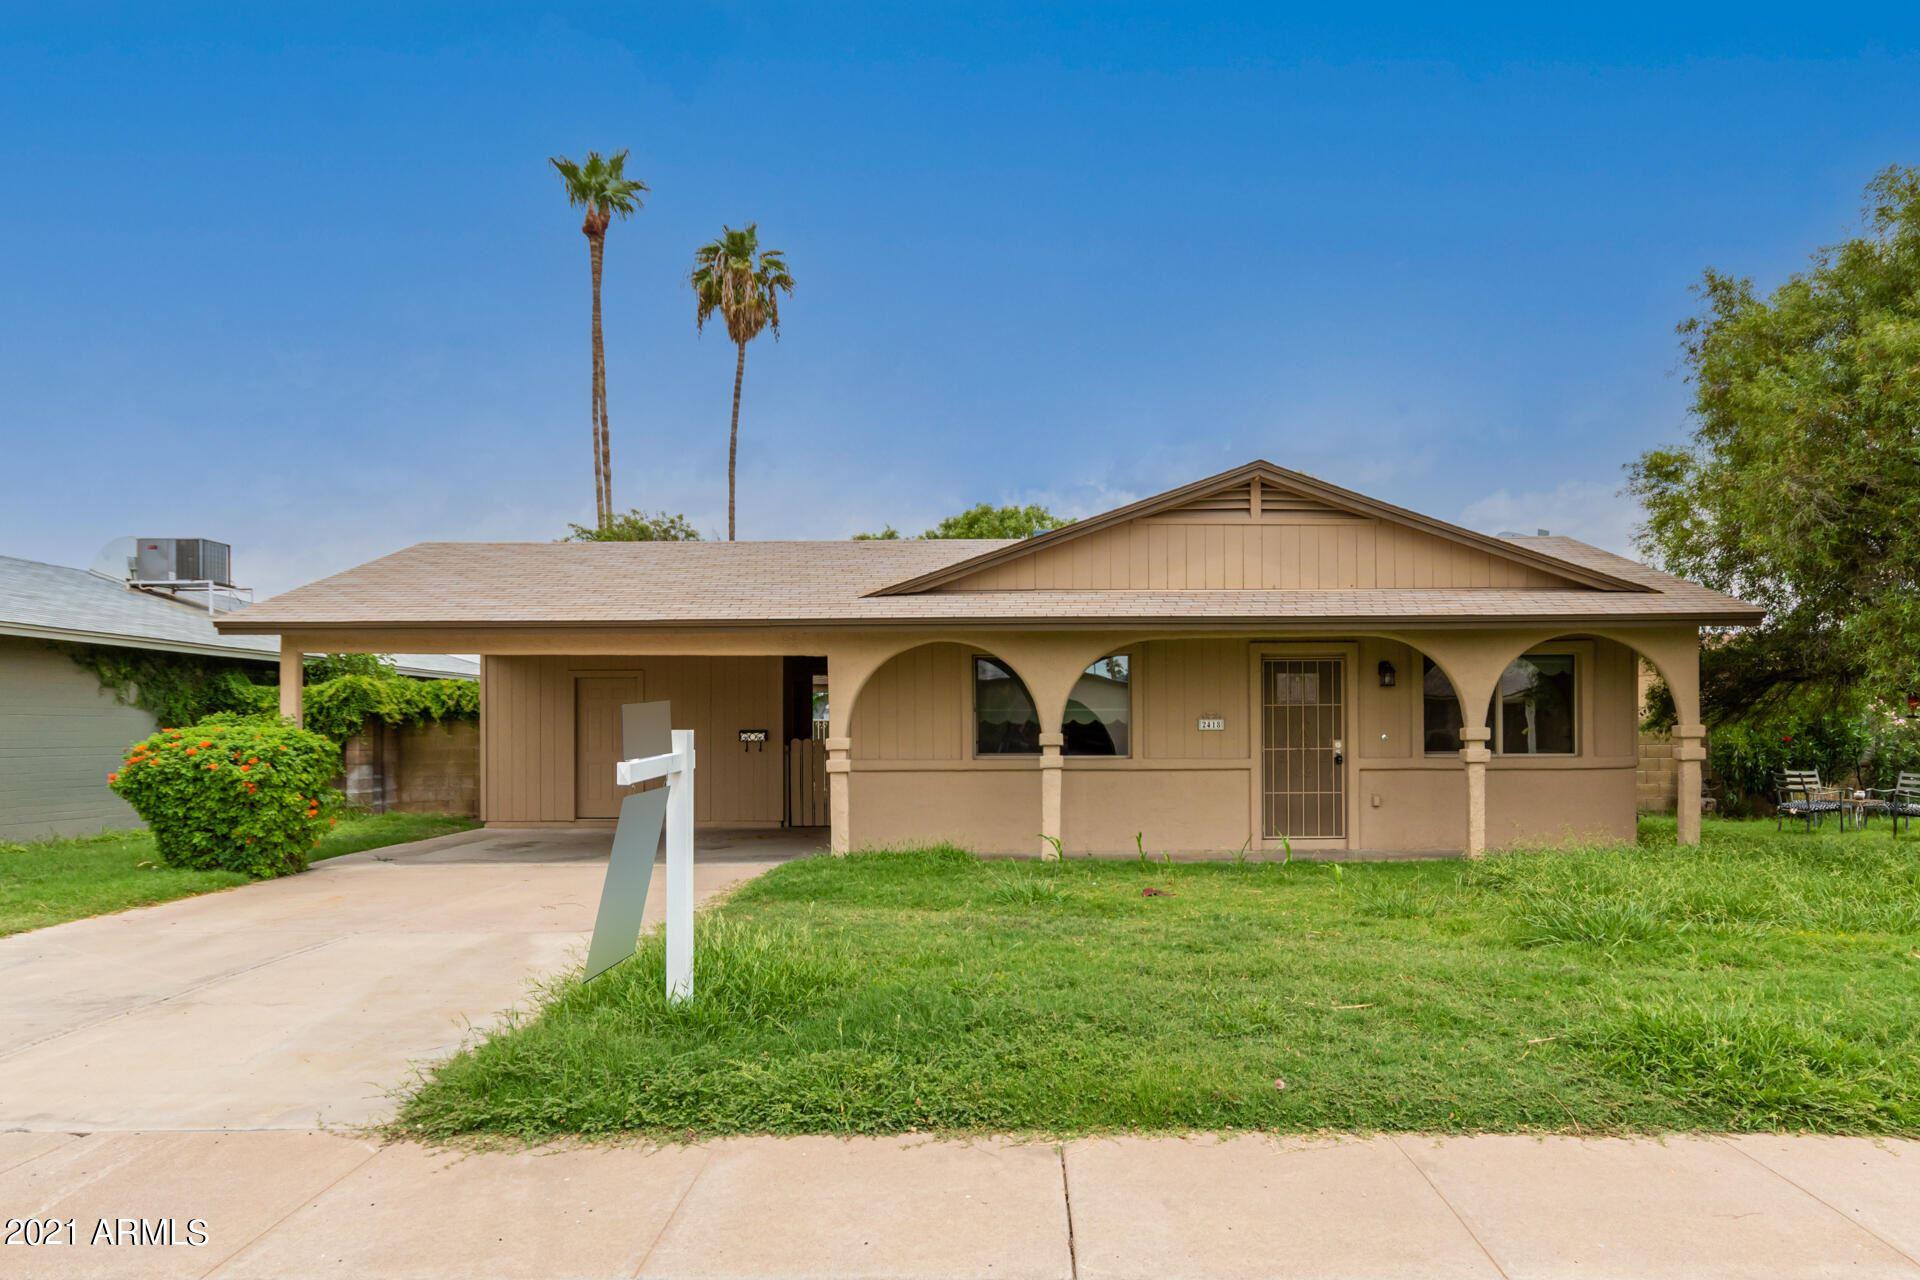 2418 E ALDINE Street, Phoenix, AZ 85032 - MLS#: 6281432